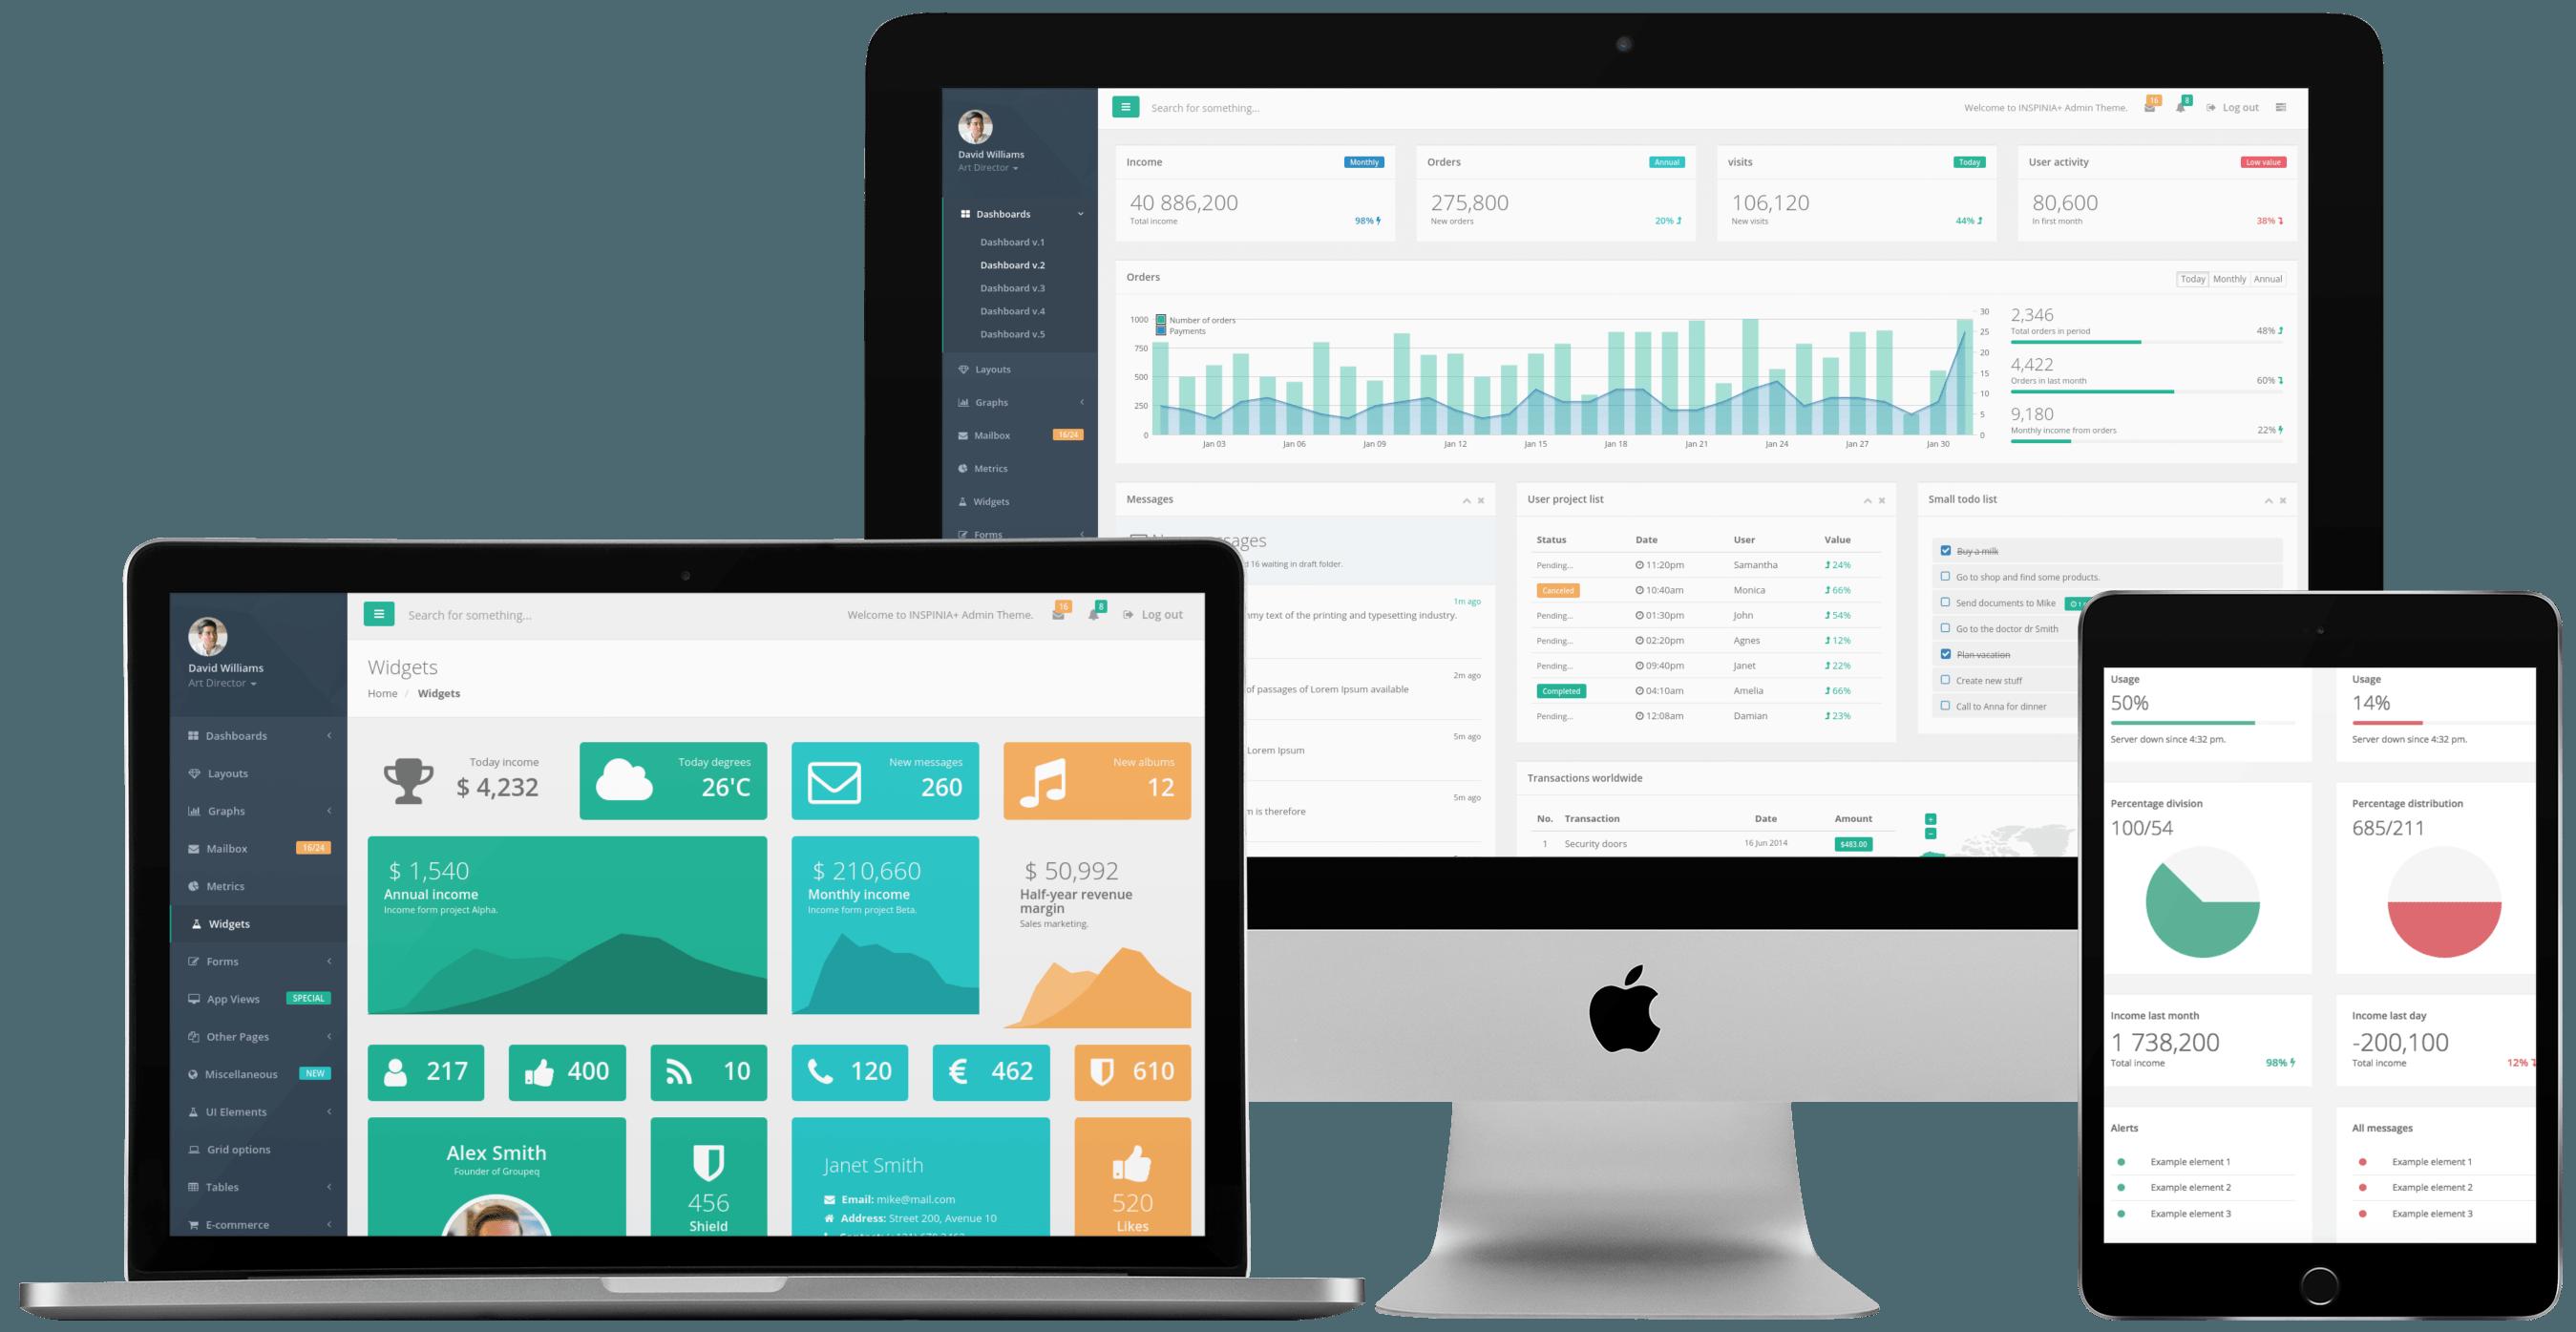 Nadzorna ploča za analizu widgeta